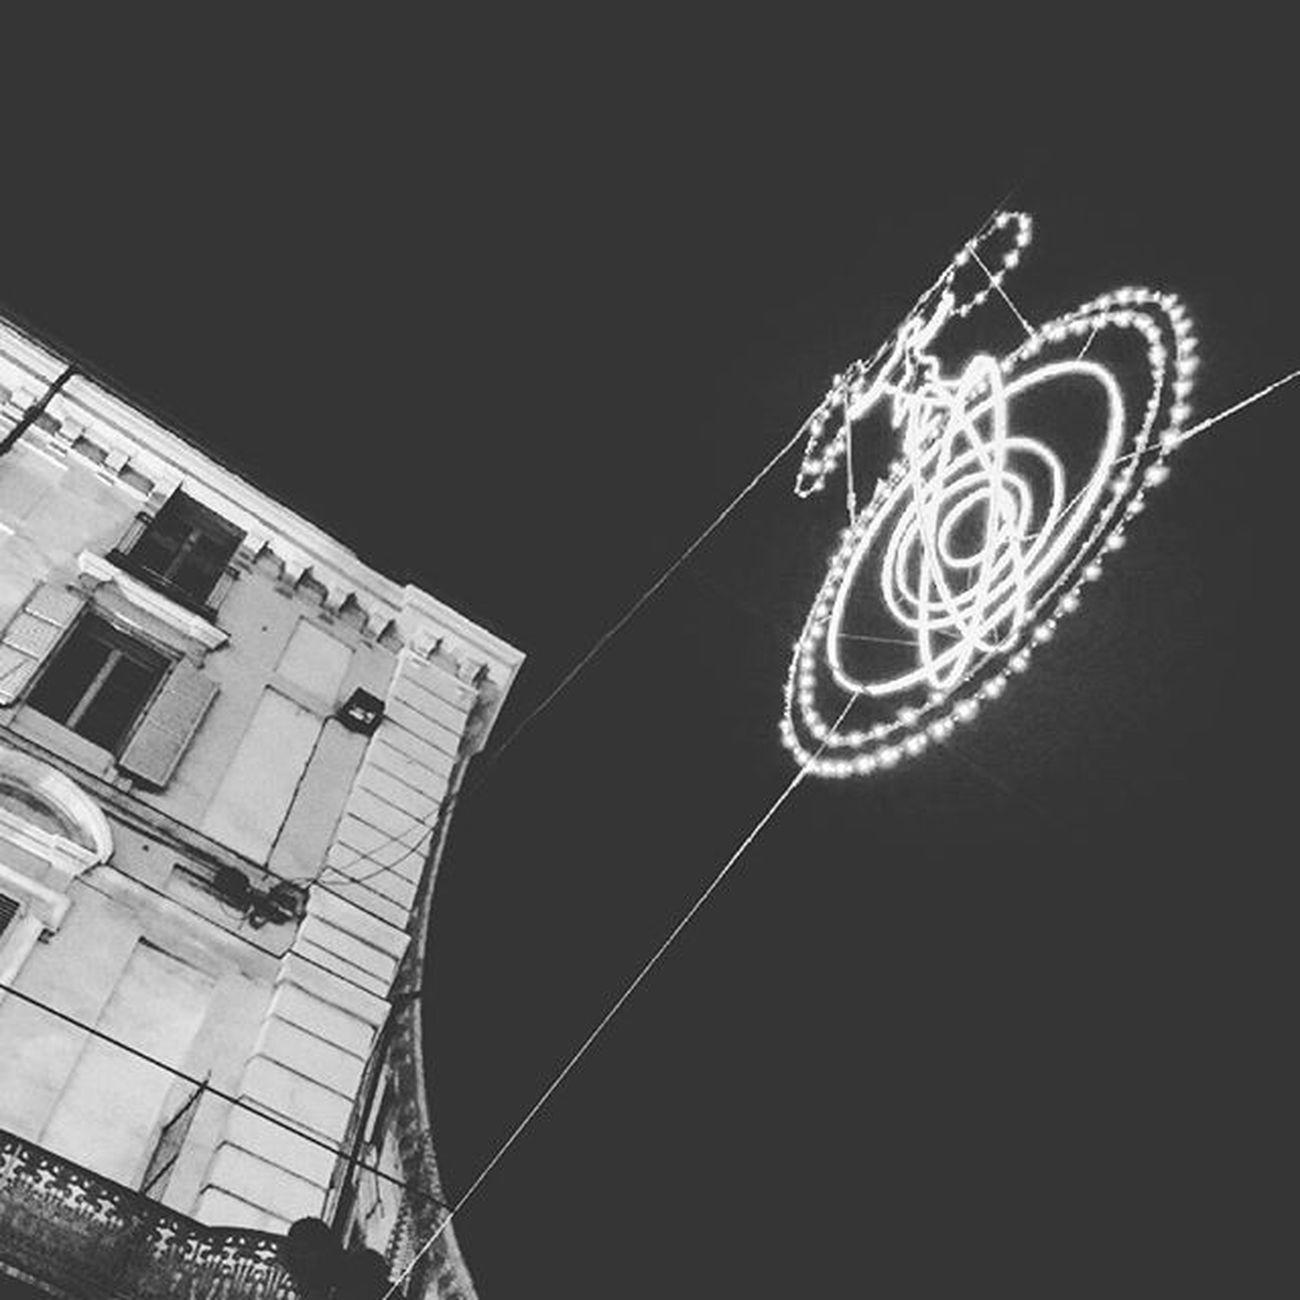 Palomar in Via Po | Luci d'artista | Torino Palomar Lucidartista Luci Arte Lights Art Viapo Torinoècasamia Torinoélamiacittá Igerstorino Ig_turin Torino Igerspiemonte Ig_piedmont Ig_piemonte Ig_italia Igersitalia Instaitalia Phototag_it Ig_europe Ig_worldclub Lookup Instatravel Travelgram Instagram bnwbnw_capturesbnw_societyigersbnw